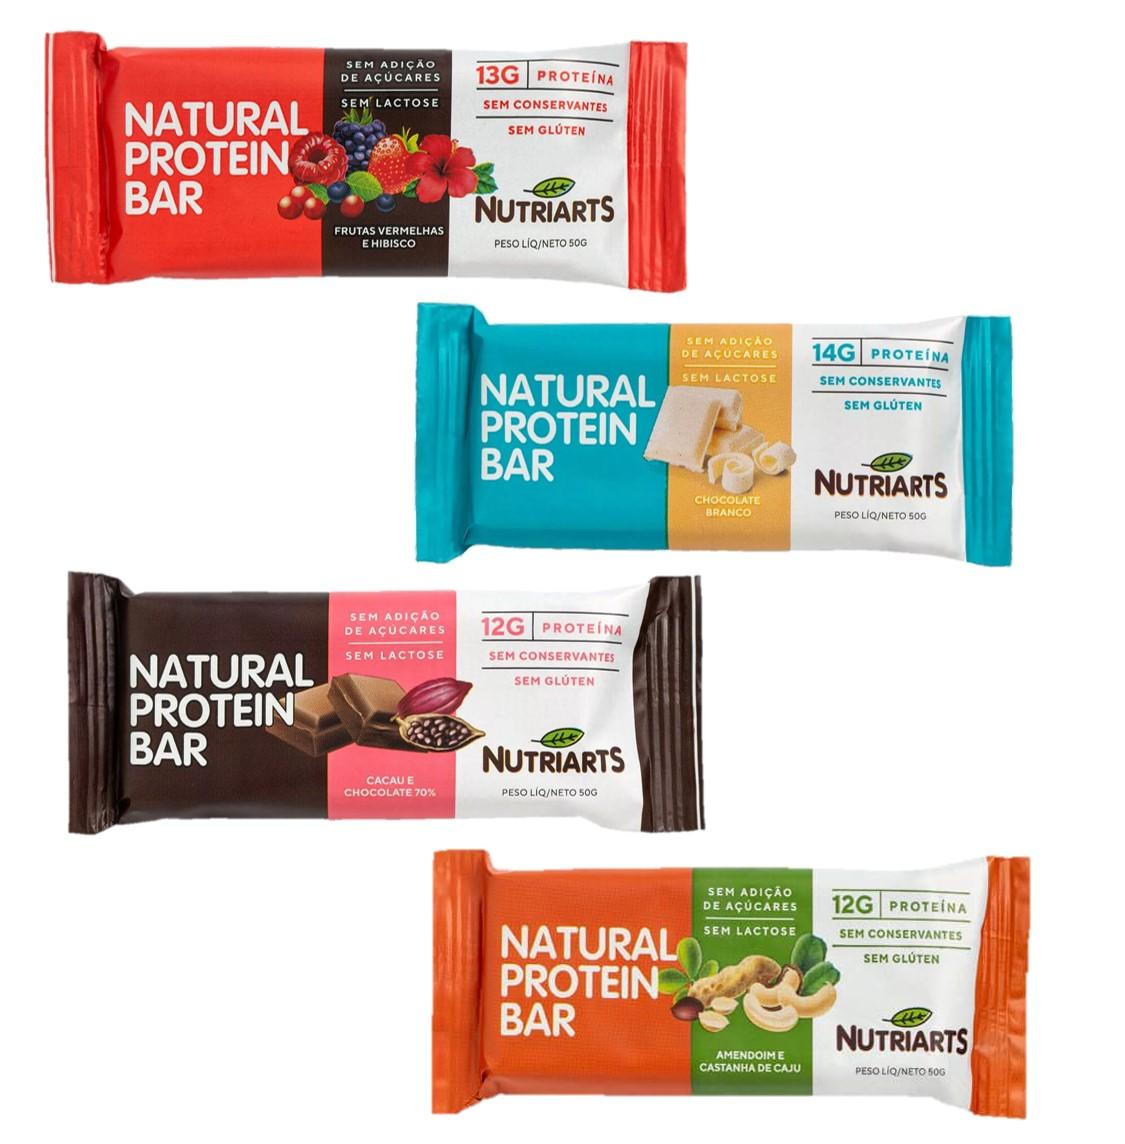 Natural Protein Bar 50g Nutriarts